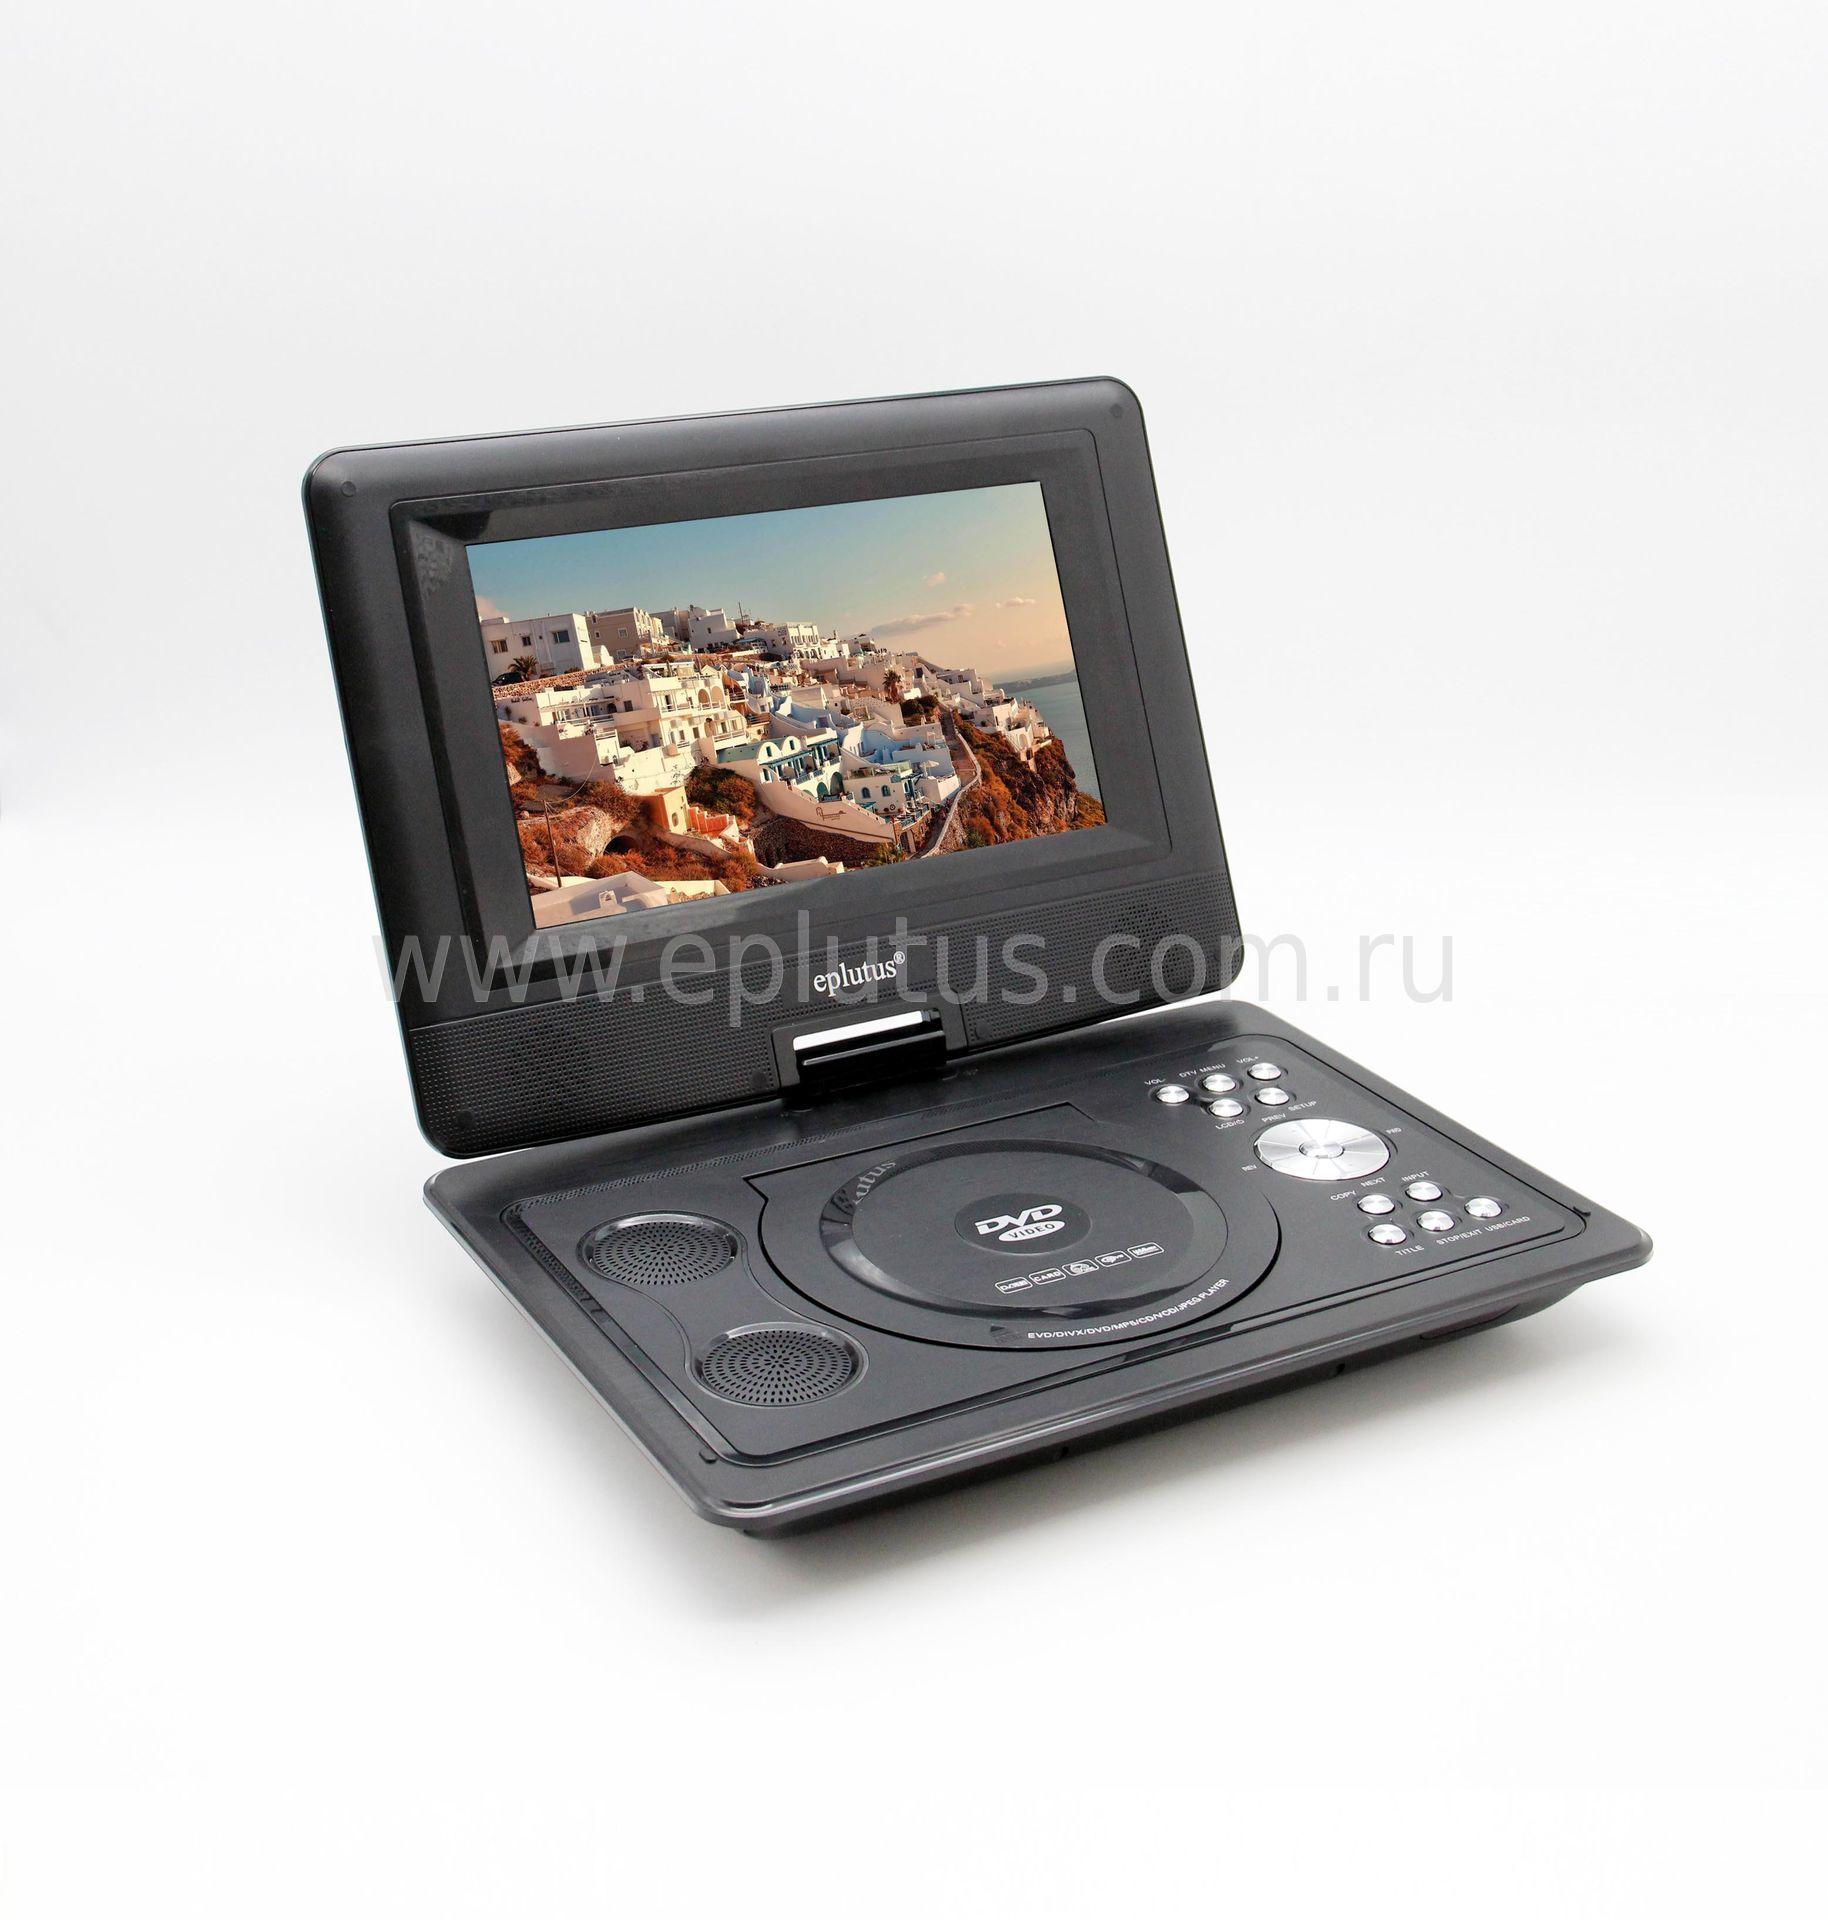 DVD-плеер Eplutus EP-9521T все цены